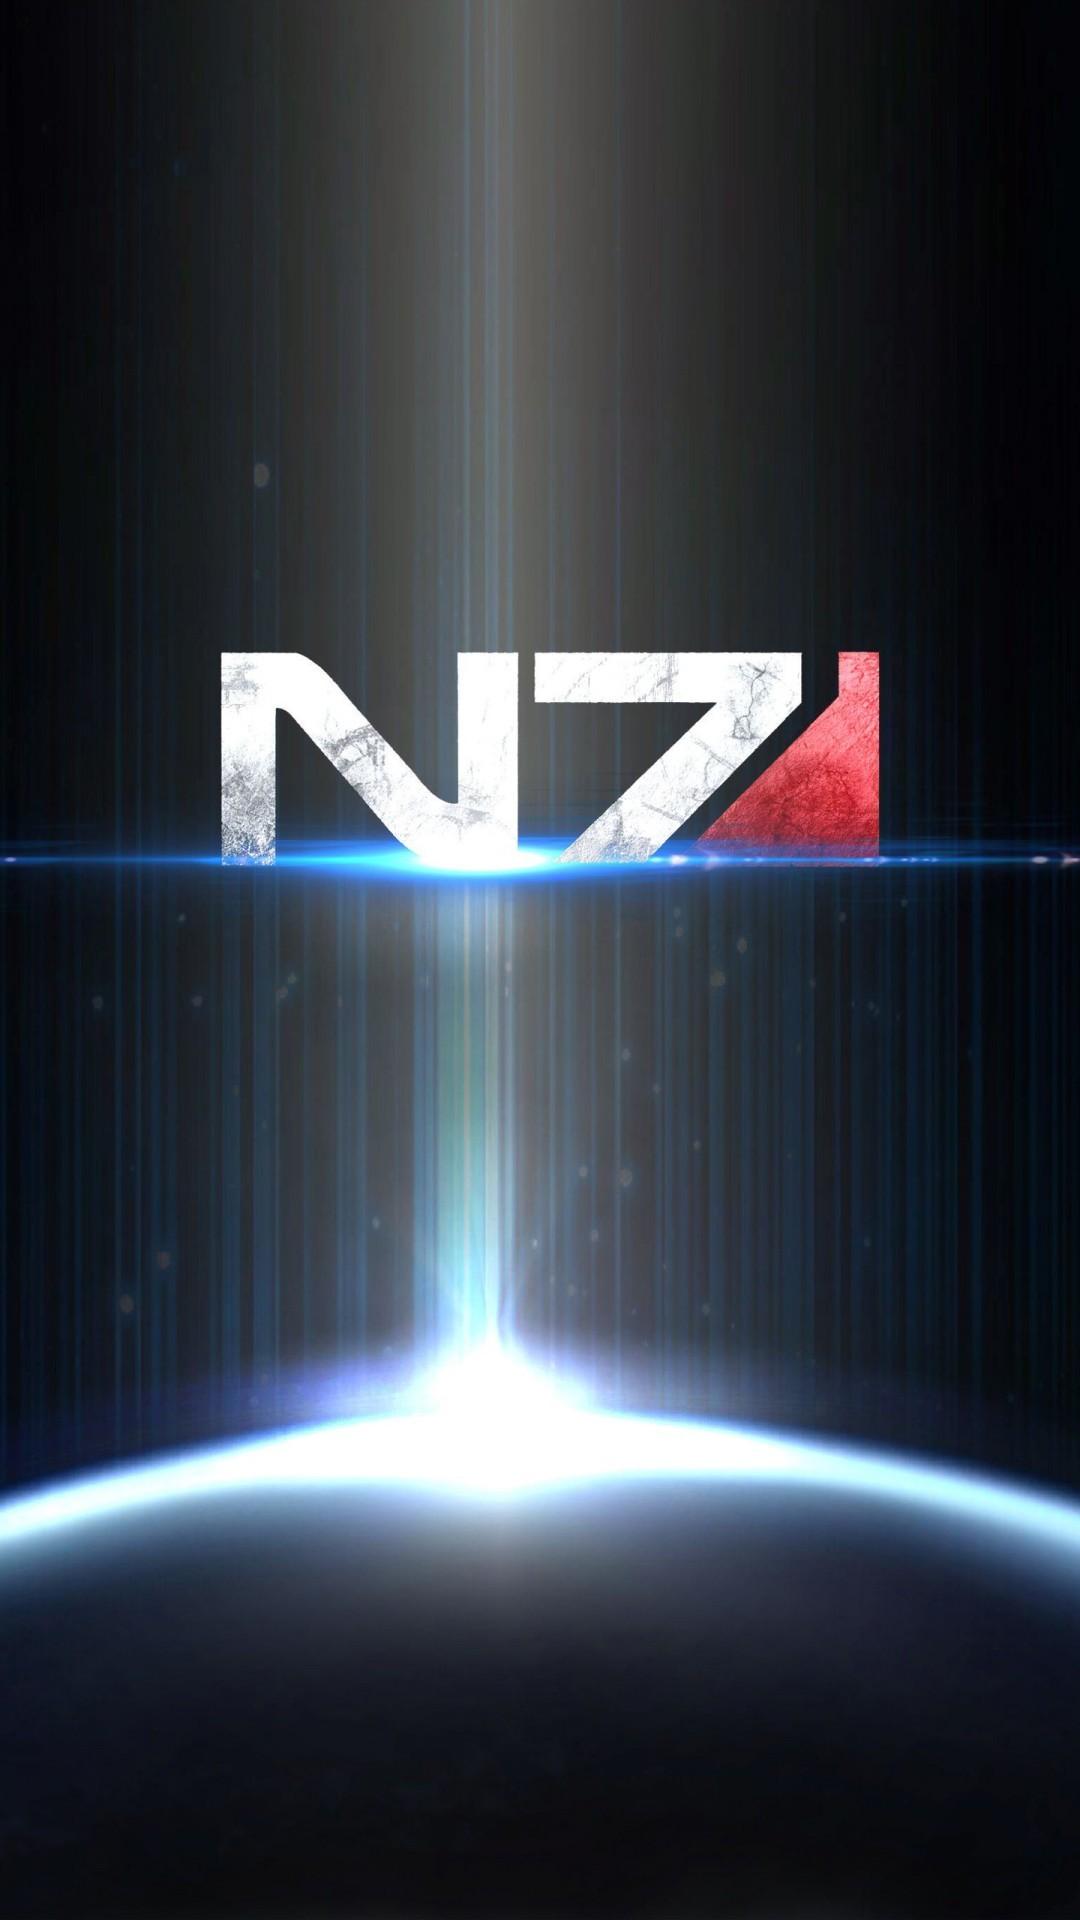 Free N7 phone wallpaper by feblesy